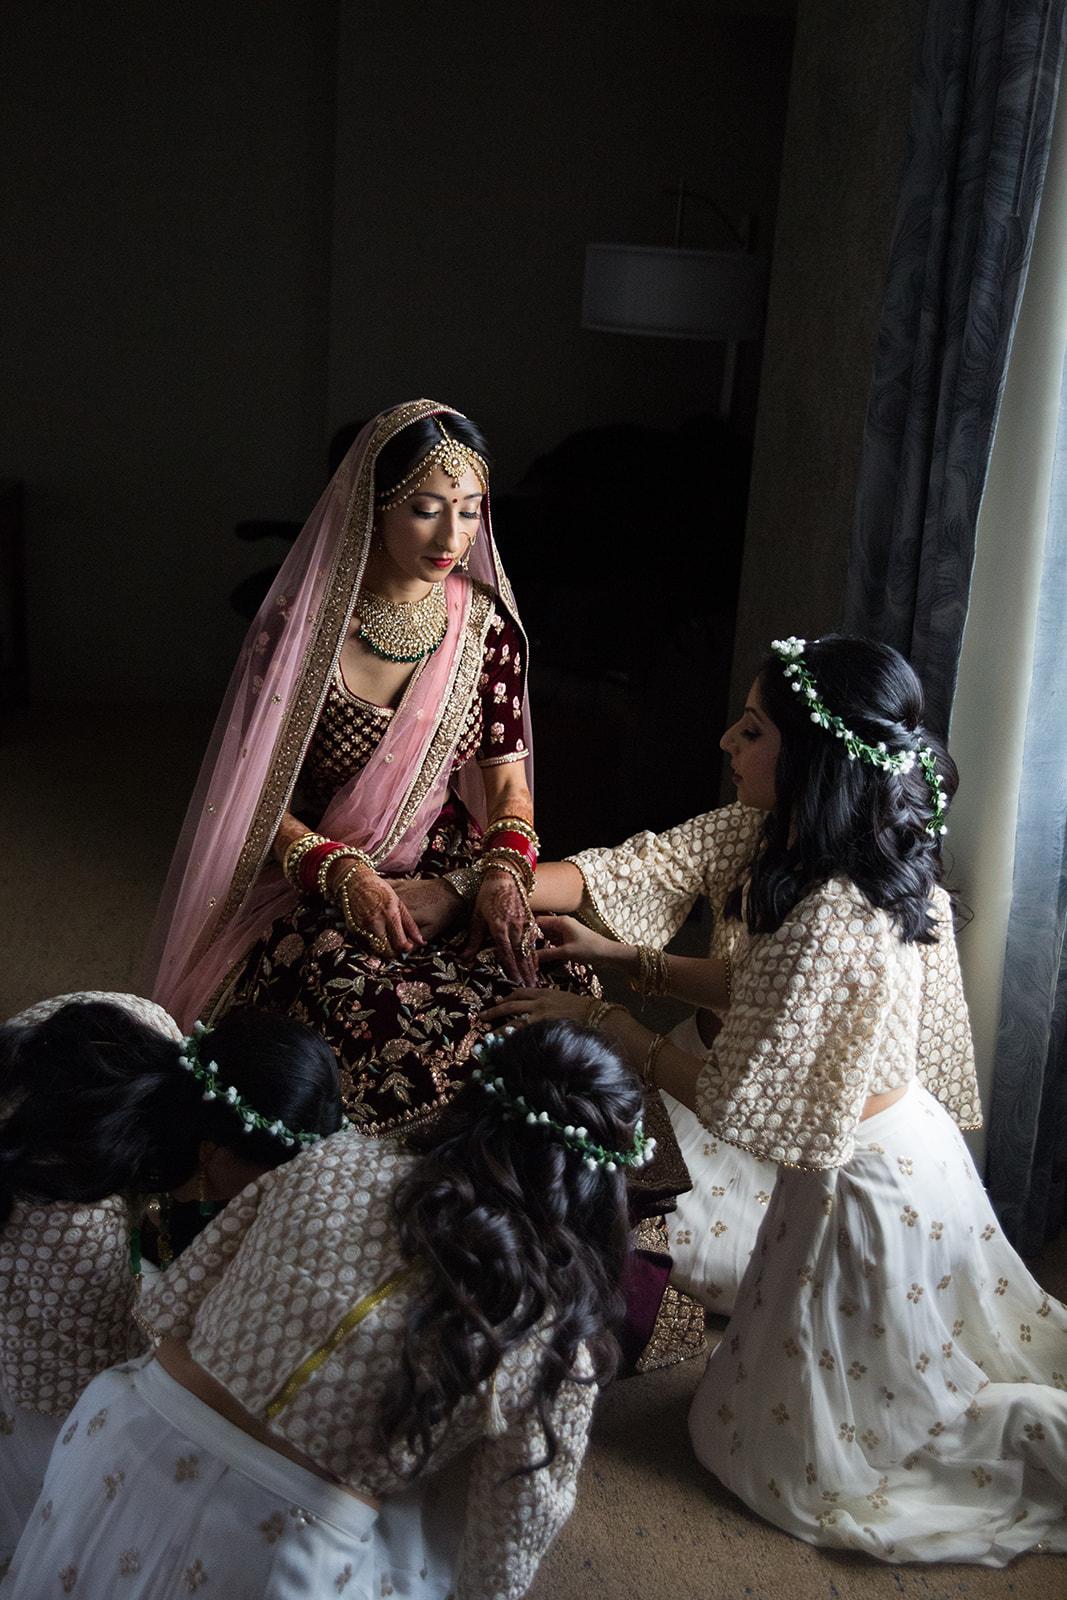 Le Cape Weddings - Puja and Kheelan - Getting Ready Bride -90.jpg